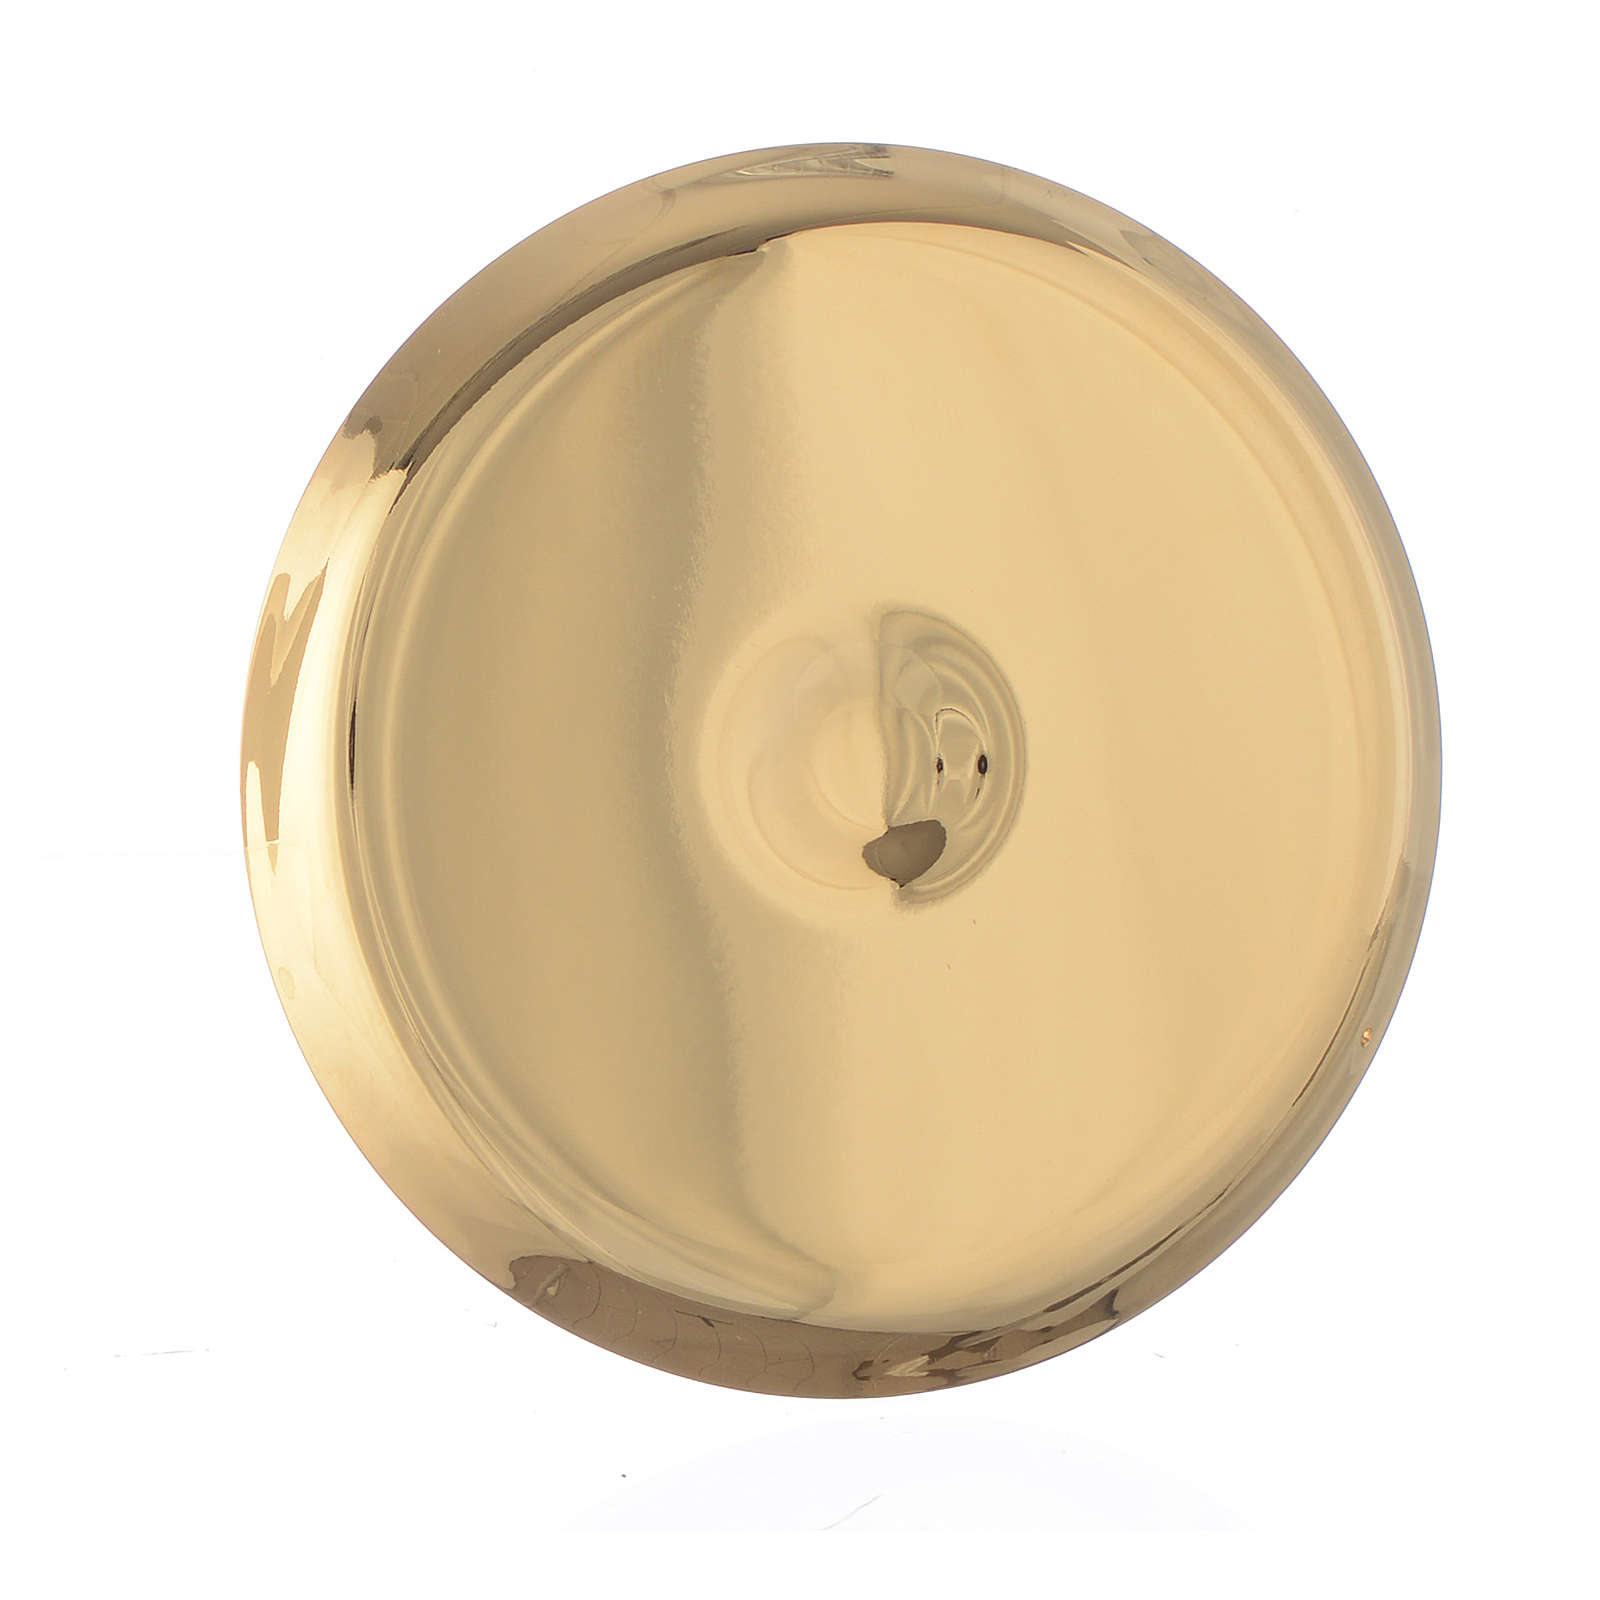 Mini paten in brass, 7cm diameter 4